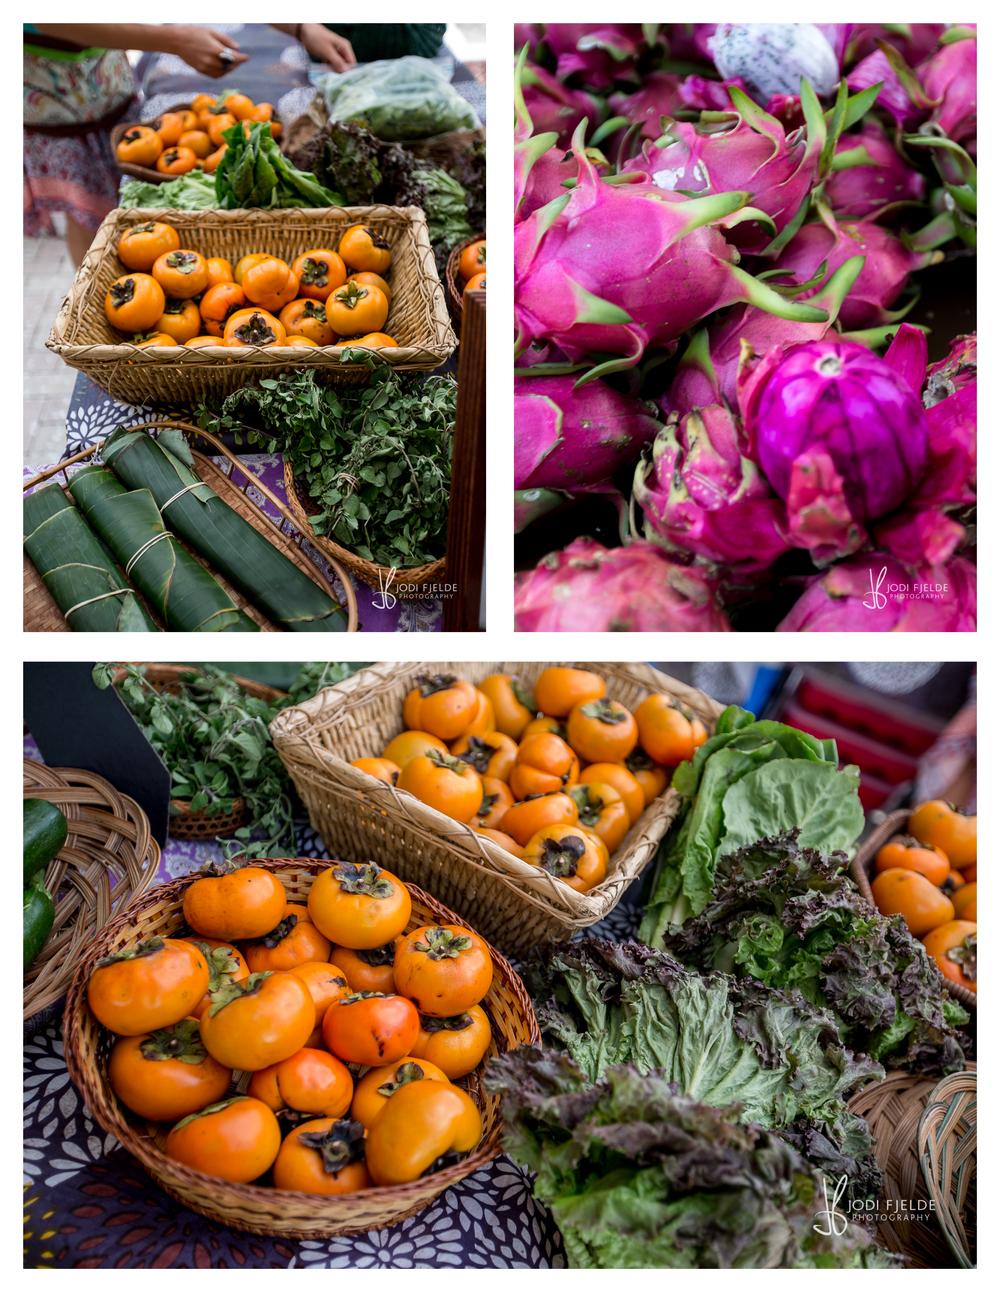 West_Palm_Beach_Green_Market_Organic_jodi_fjelde_Photography_3.jpg